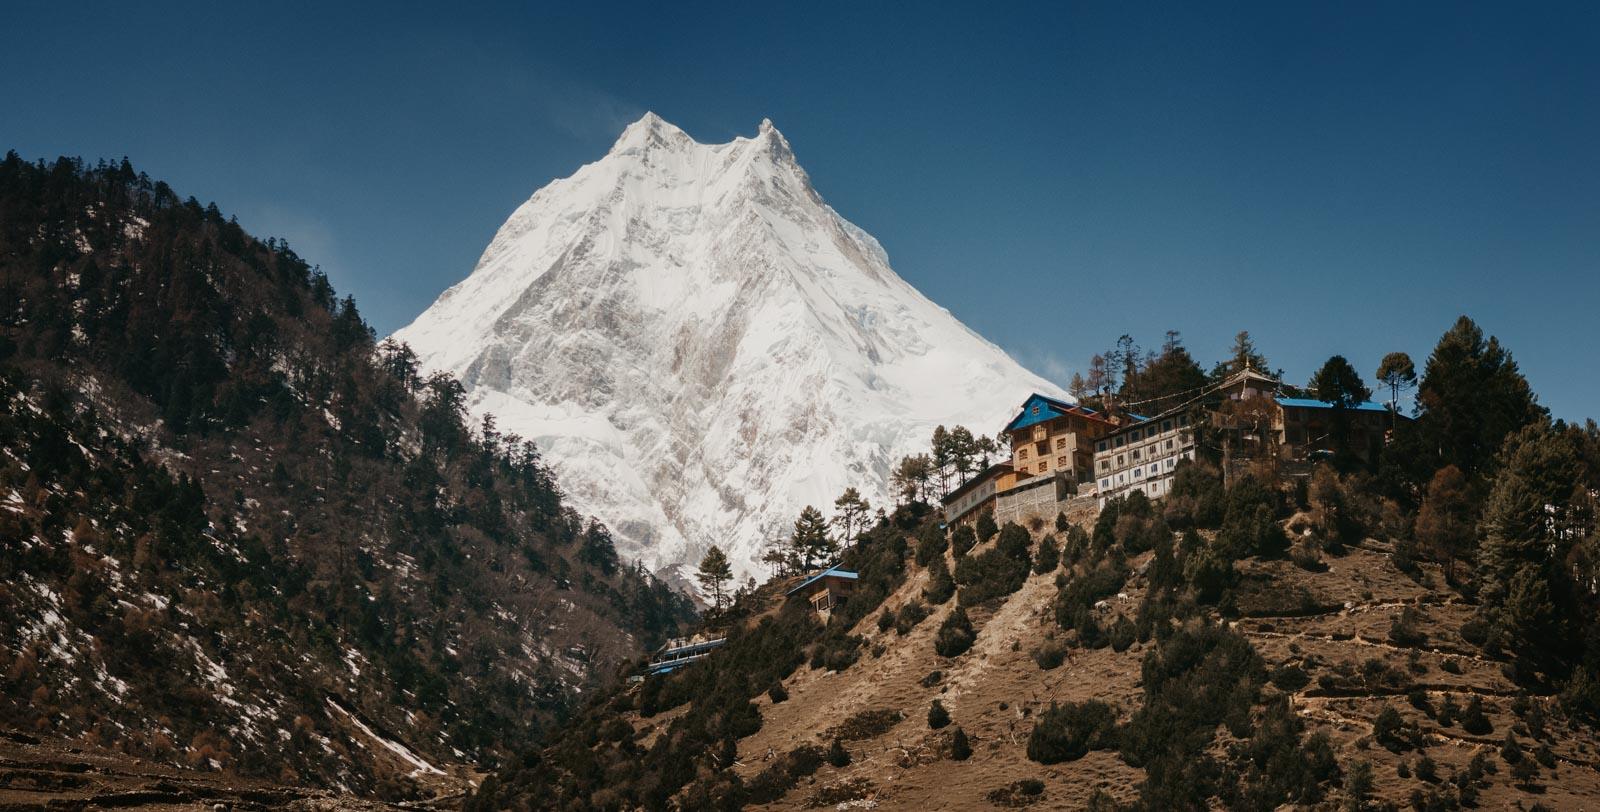 Mt. Manaslu,  8,163 metres  (26,781 ft) above sea level.